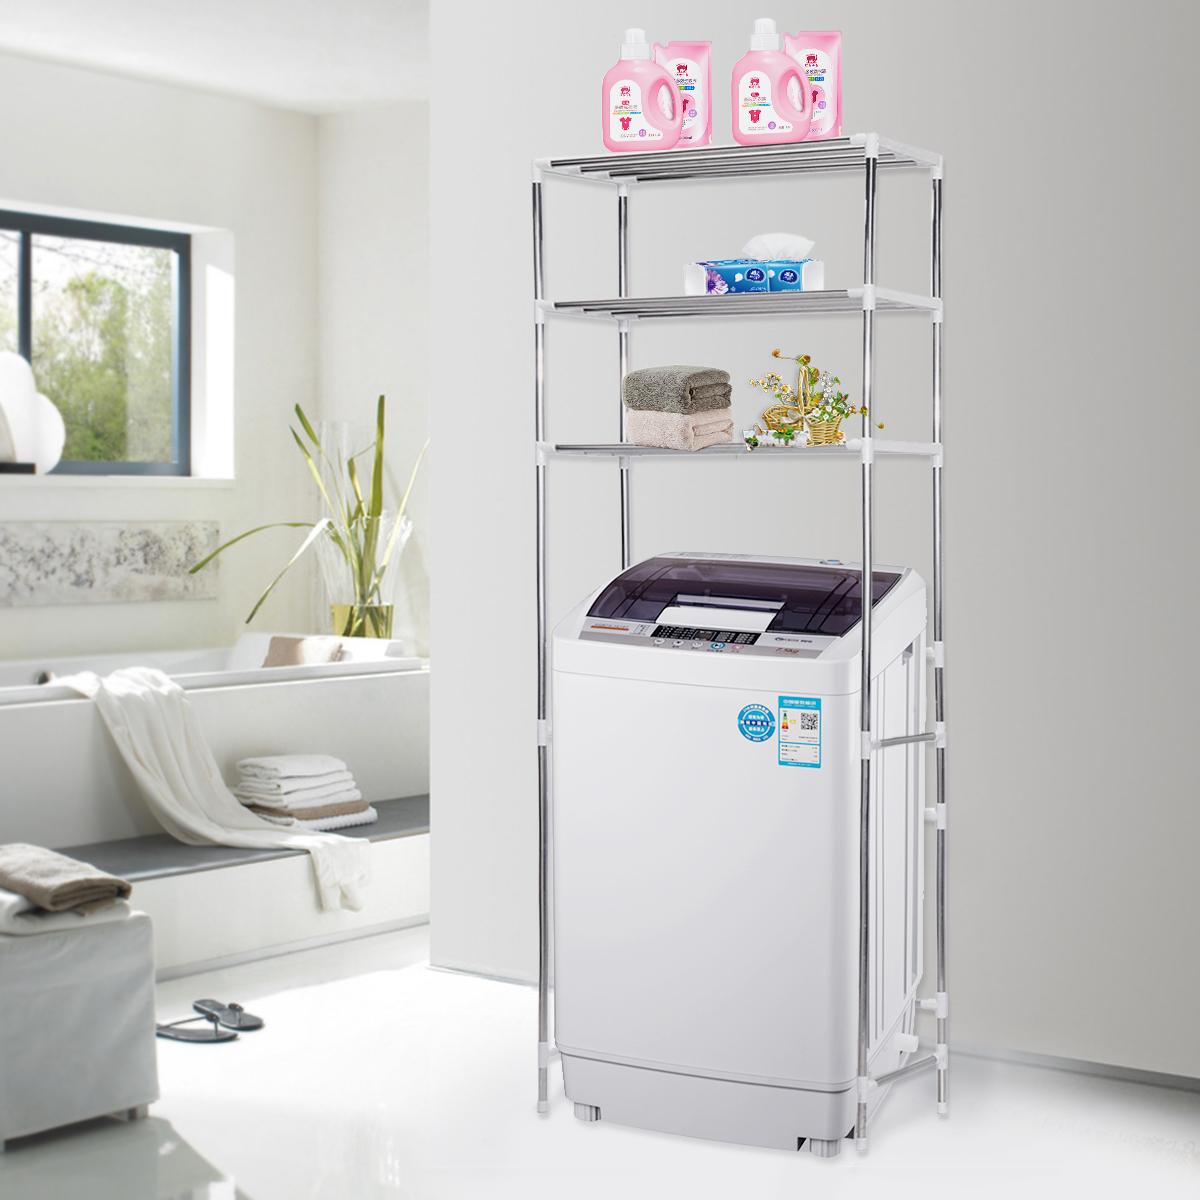 details about storage shelf over toilet/bathroom/laundry/washing machine  rack unit organizer over Washing Machine Storage